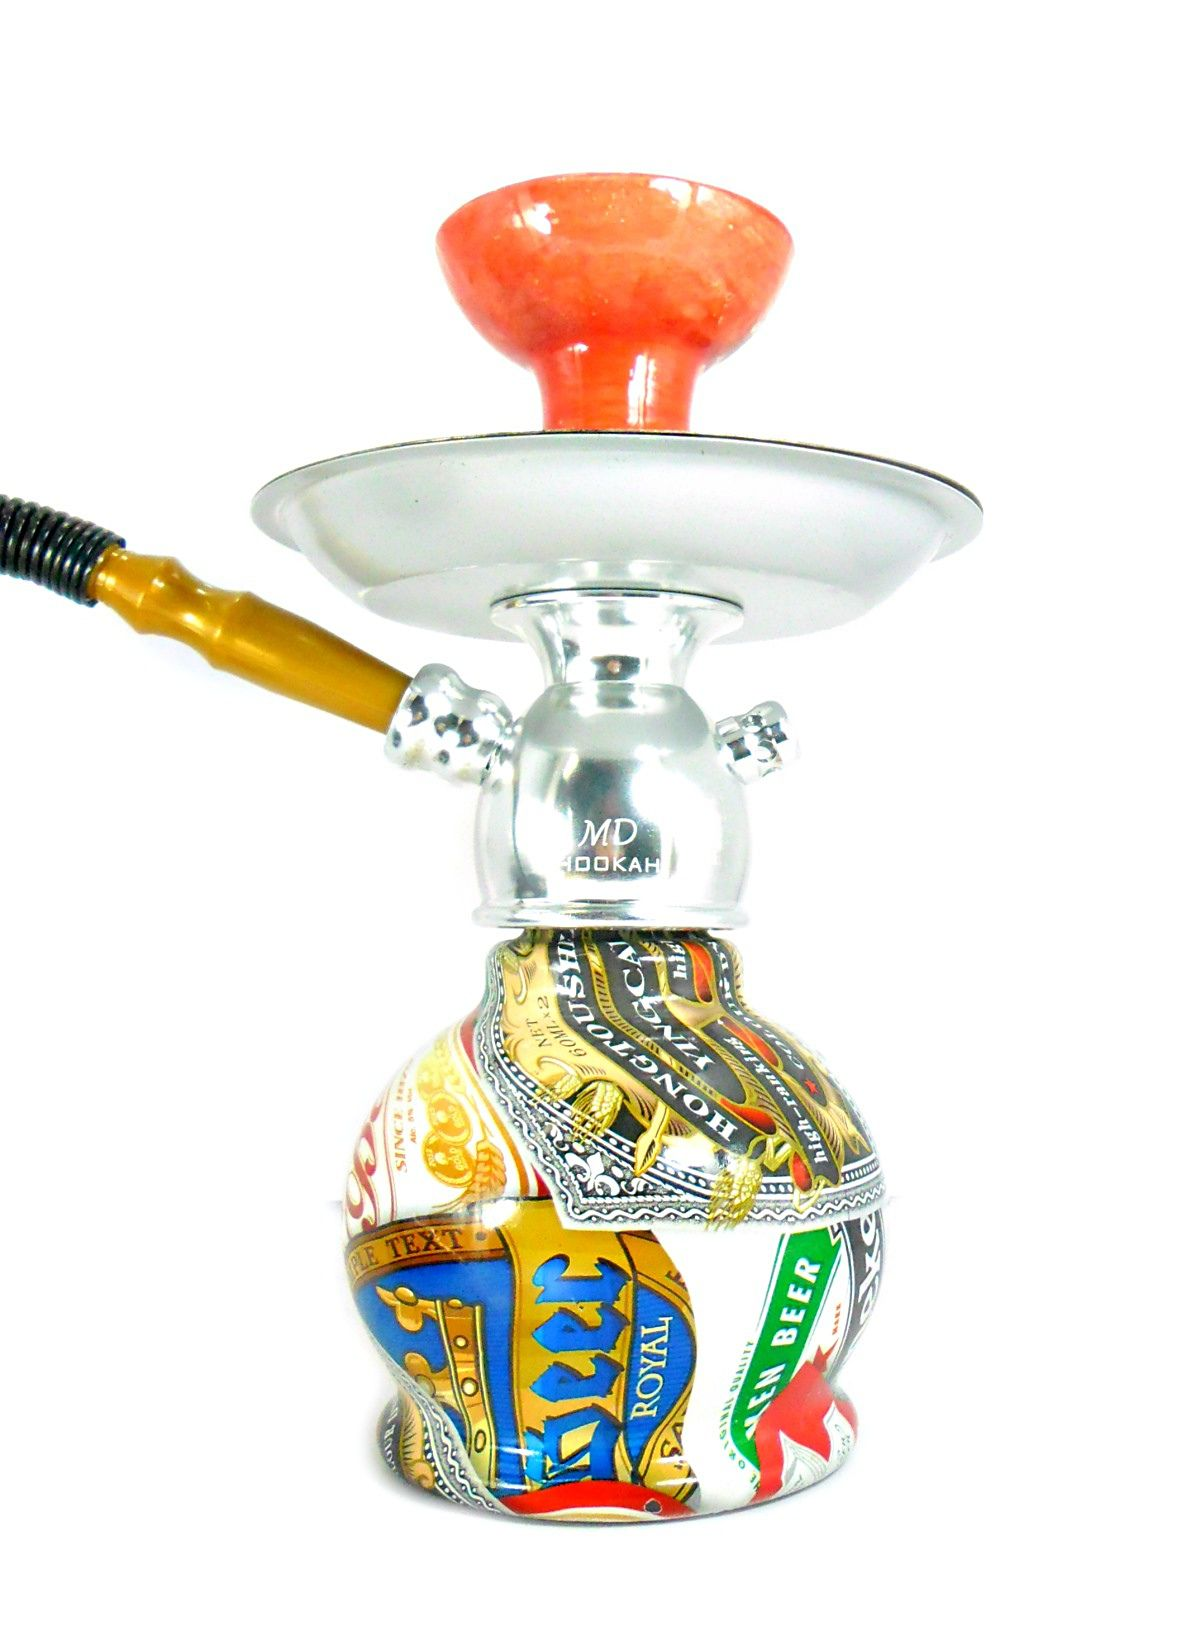 Narguile MD Hookah em alumínio, vaso Ball e prato metálico estampa Beer Label, mangueira Go Hose, rosh cerâmico.